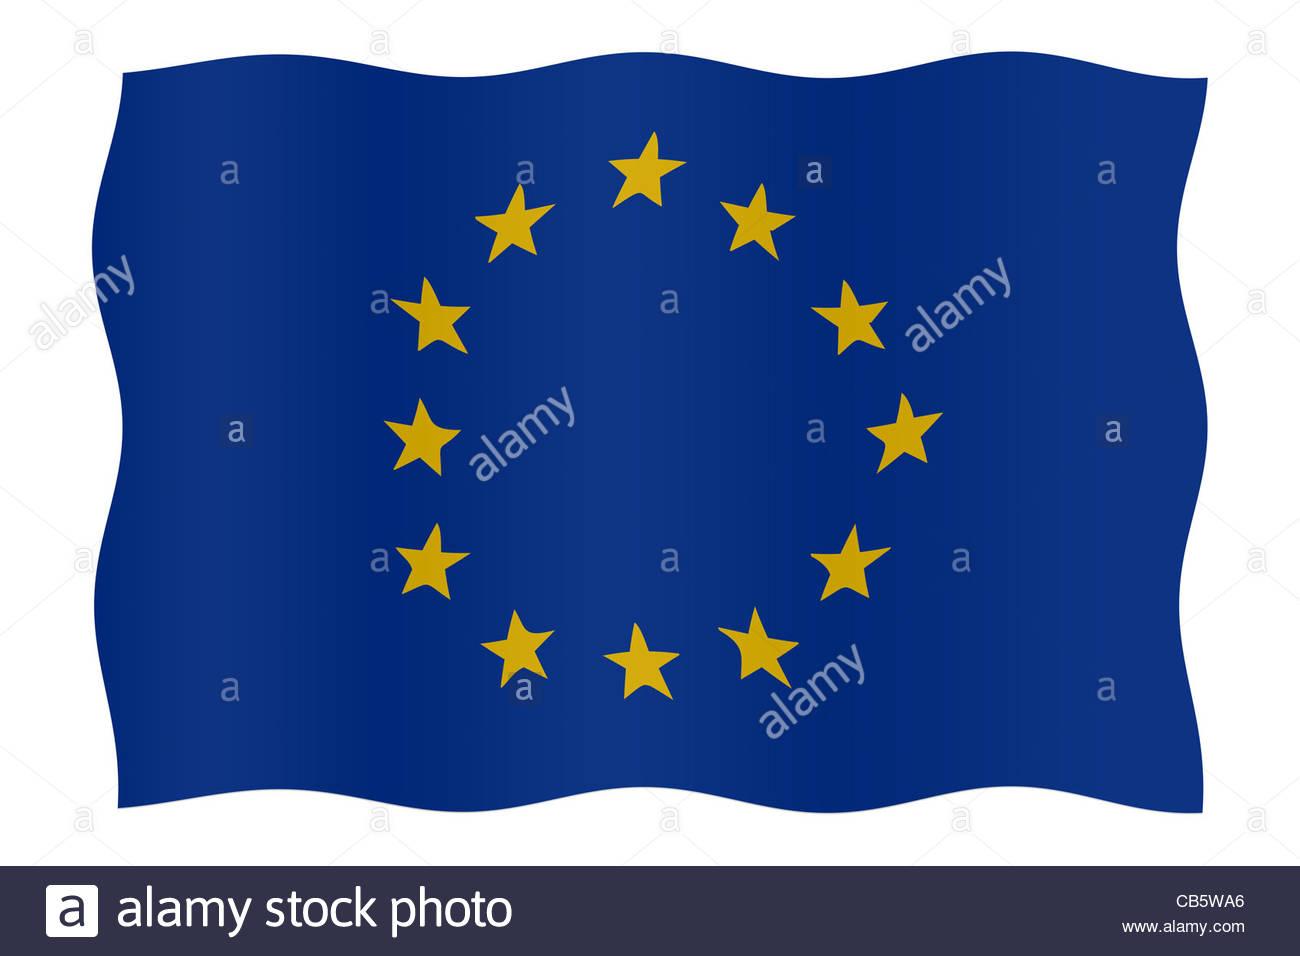 Digital illustration - flag of EU - Stock Image